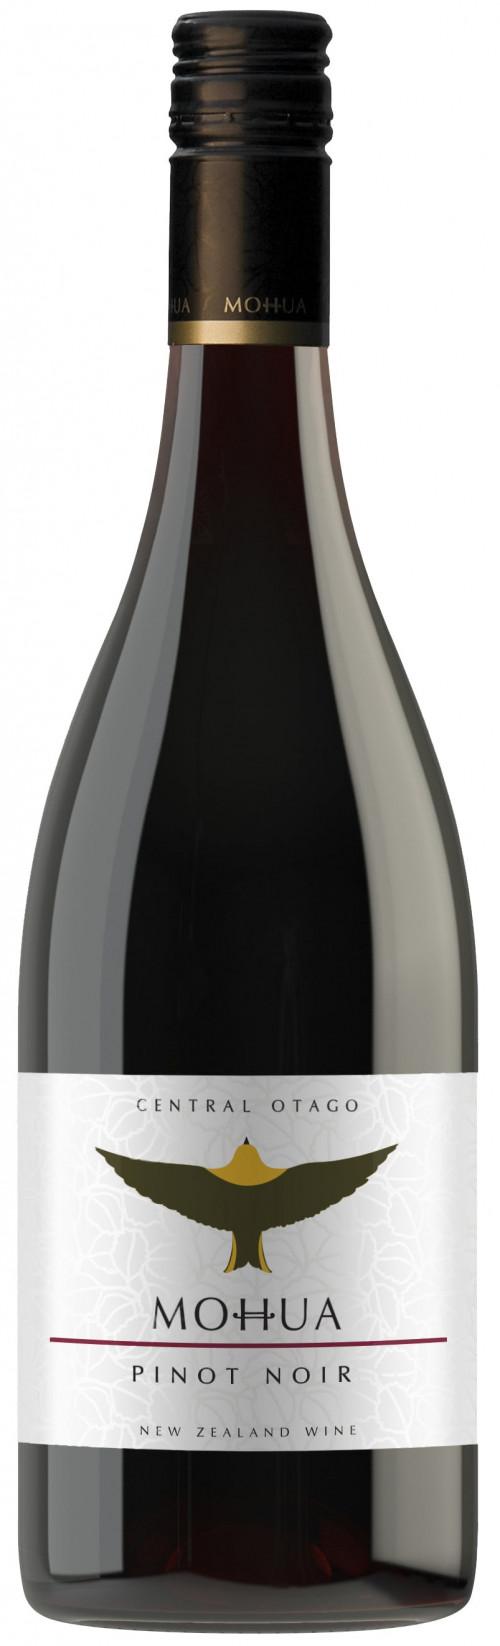 2017 Mohua Pinot Noir 750ml